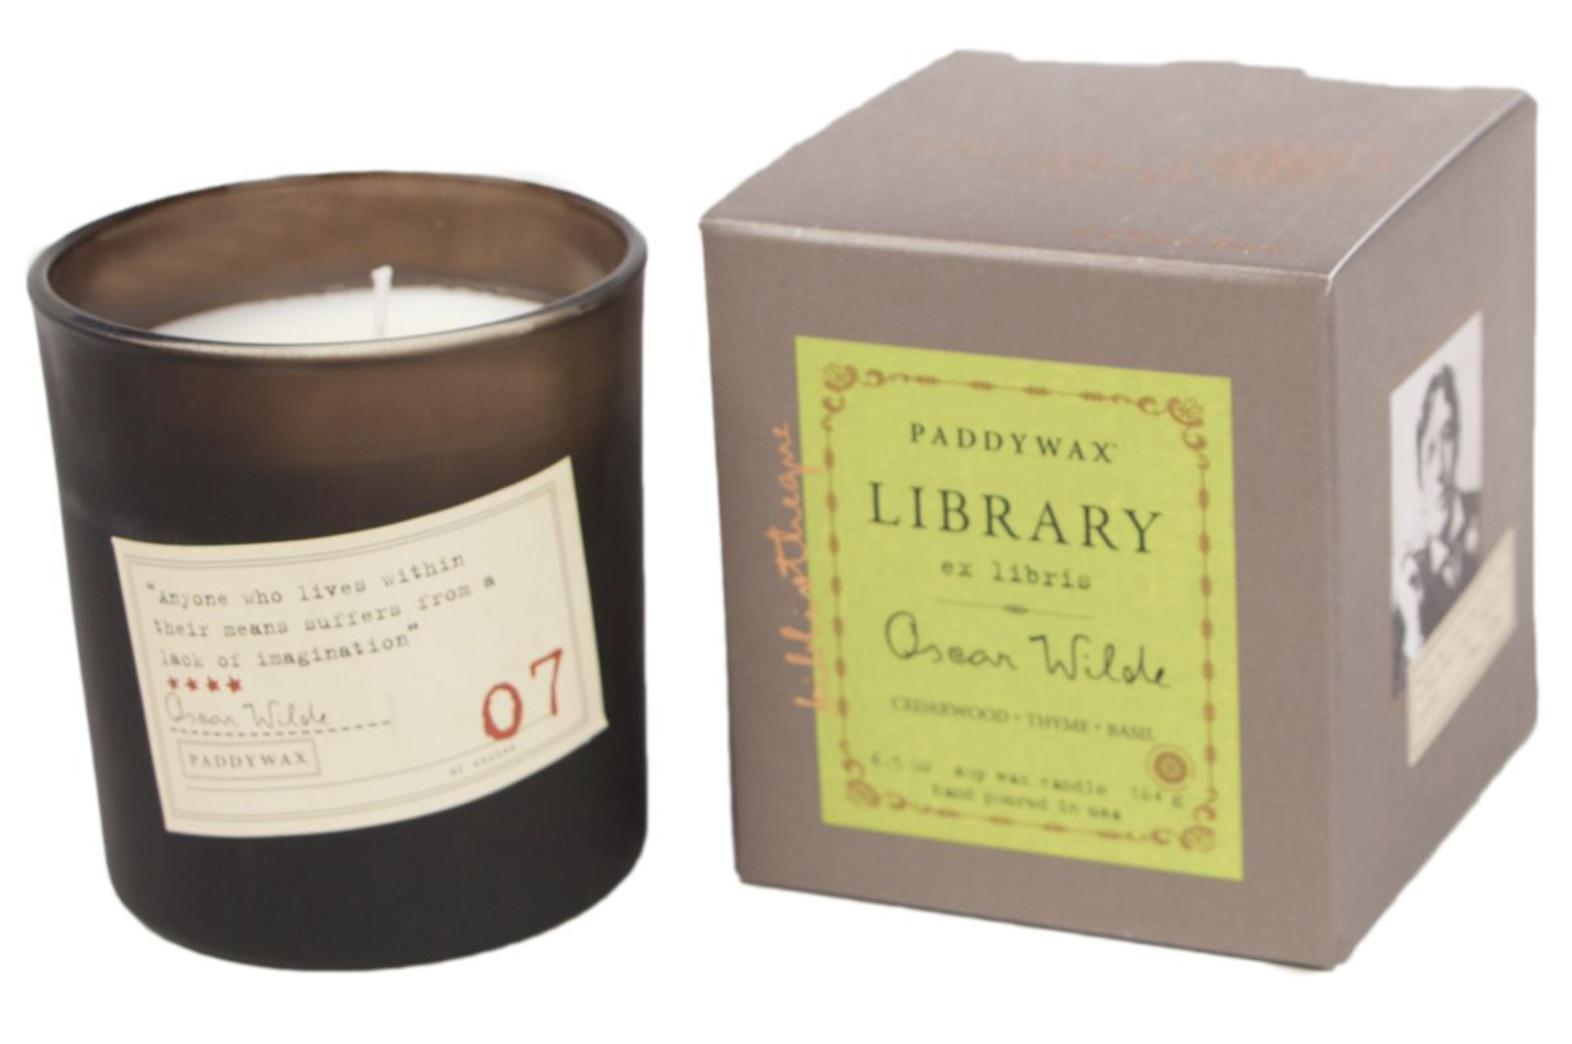 Paddywax Library Candle, Oscar Wilde, 6.5oz